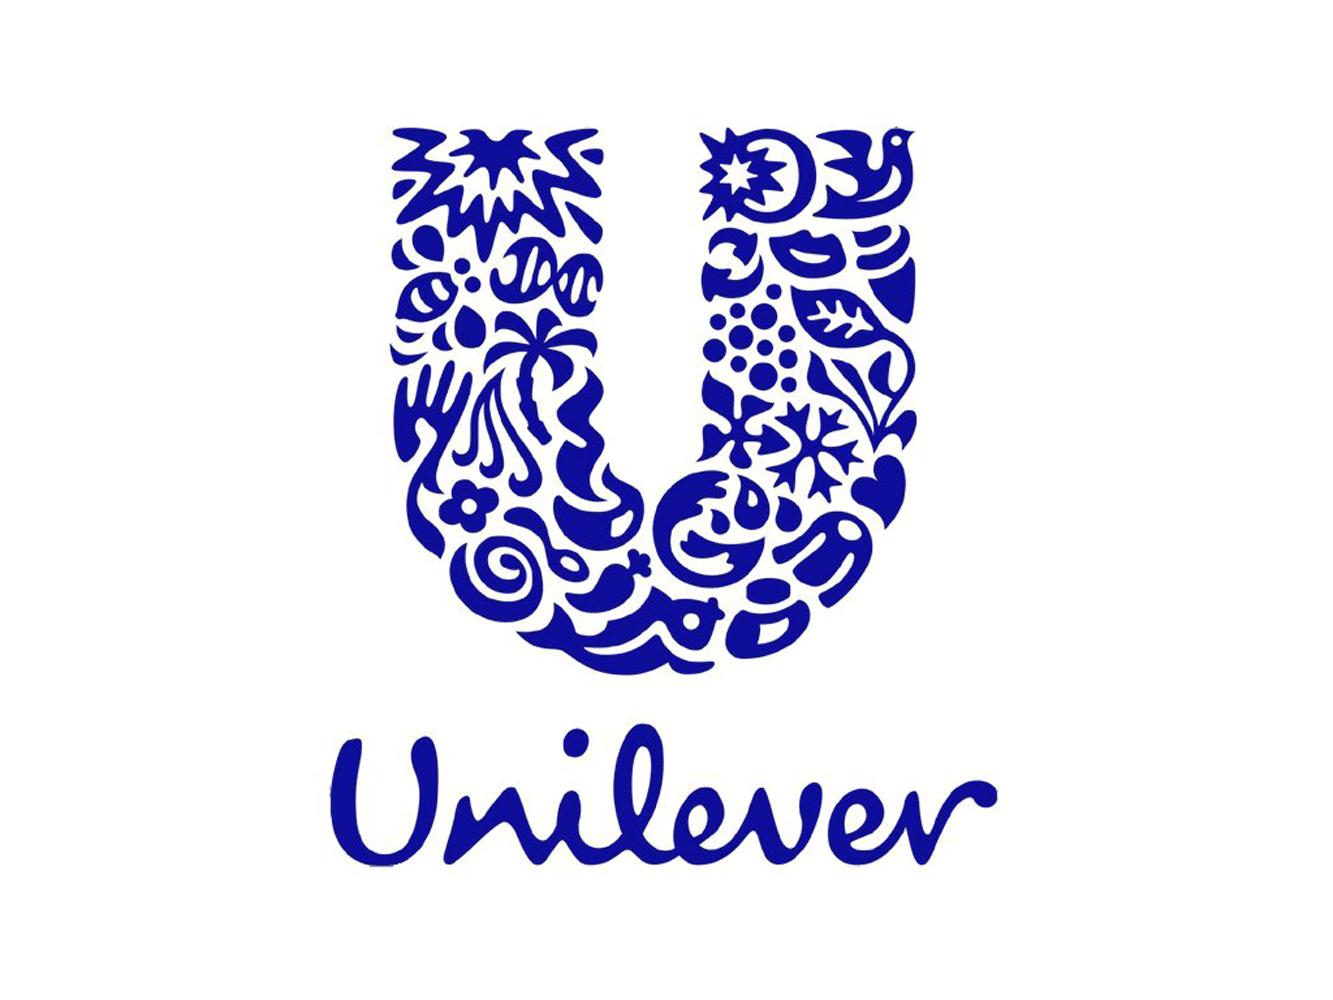 Unilever logo meaning